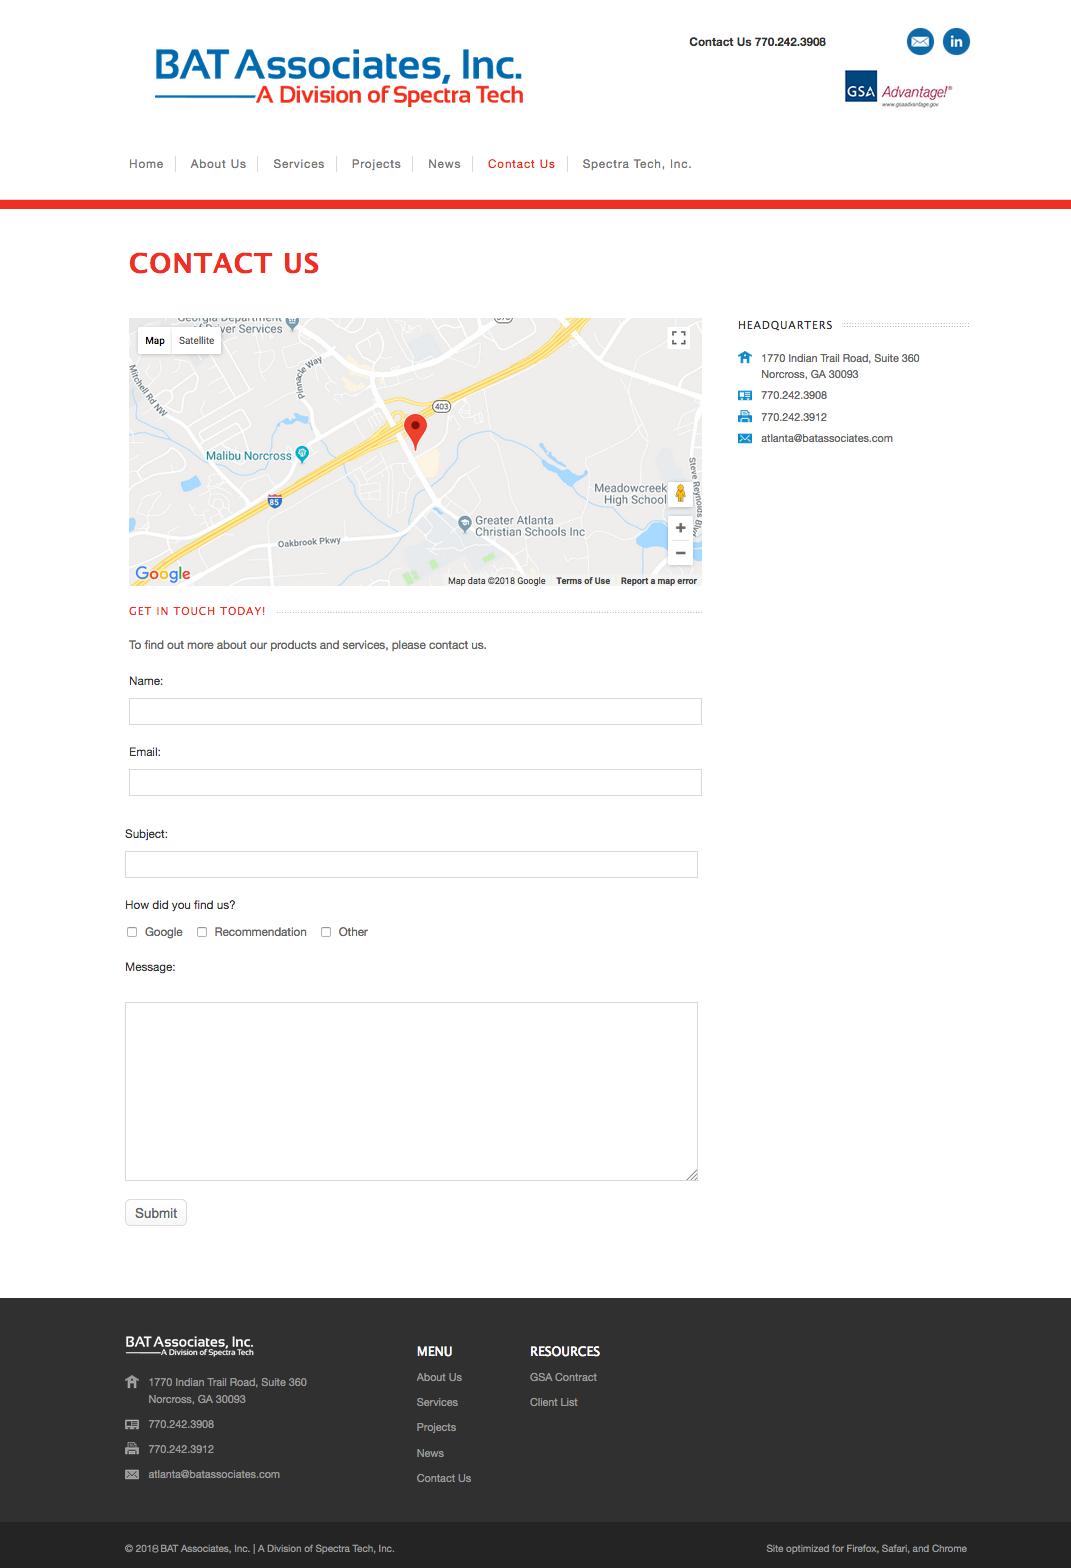 Illustrator photoshop dreamweaver html5 Web Design  content creation branding  css